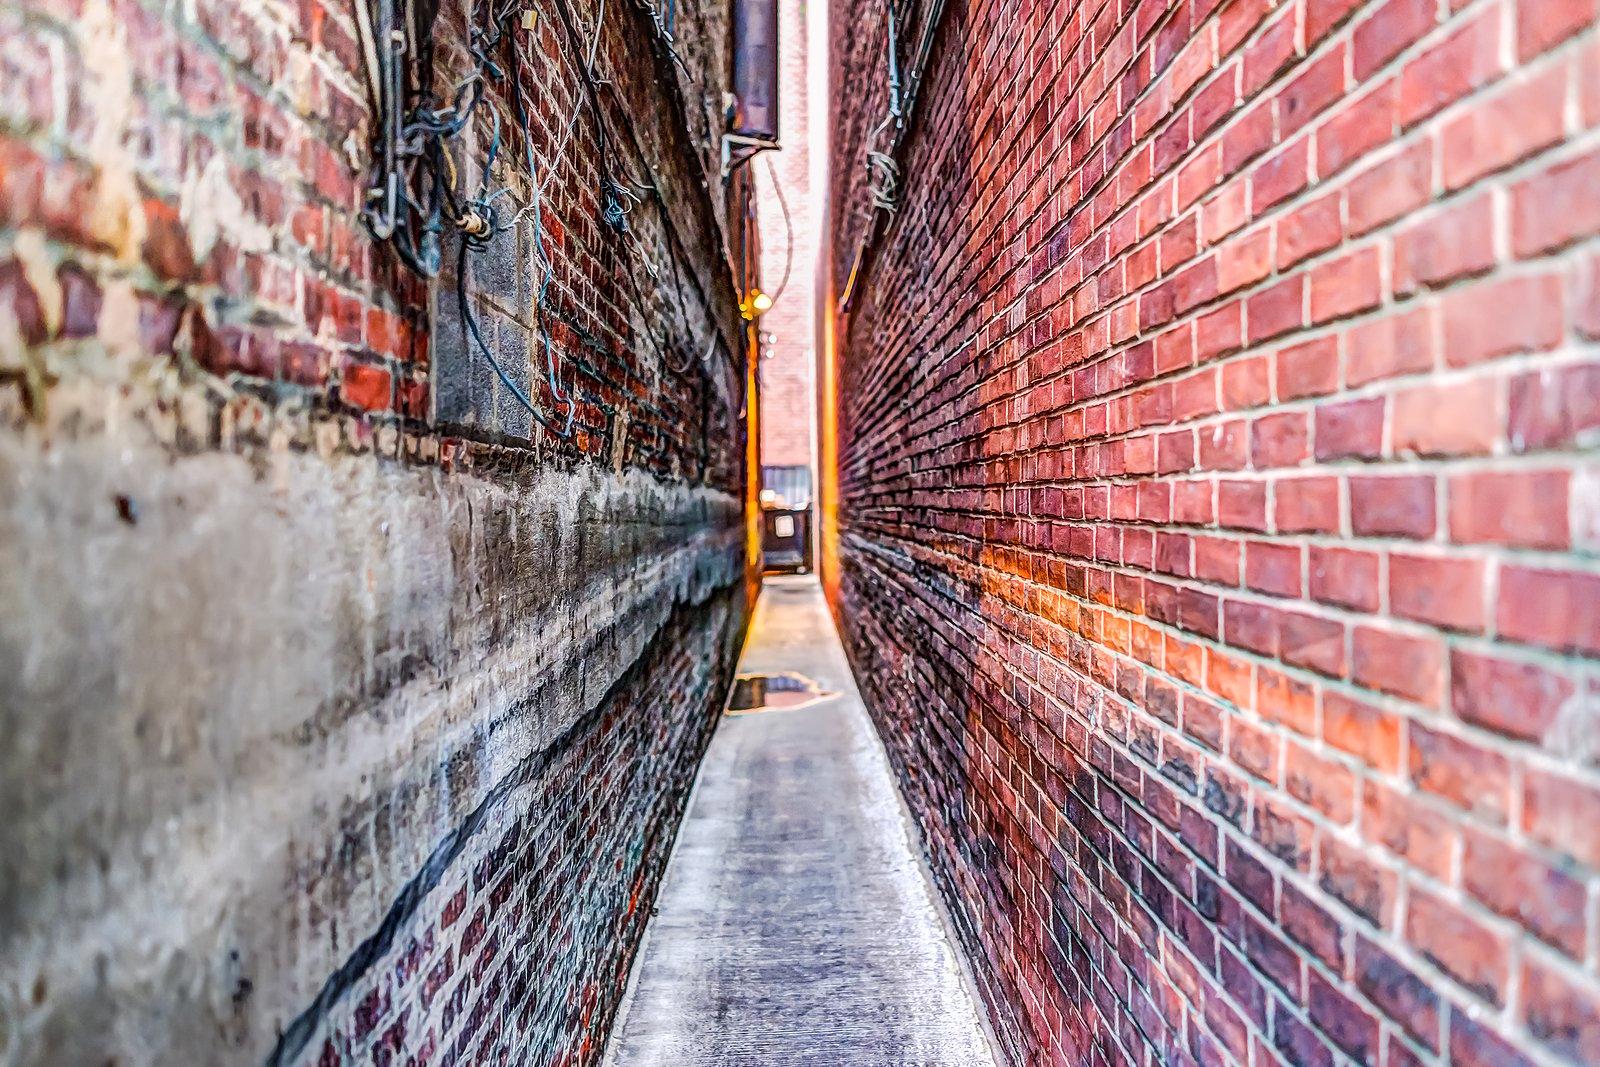 bigstock-Narrow-Brick-Alley-In-Georgeto-203144224